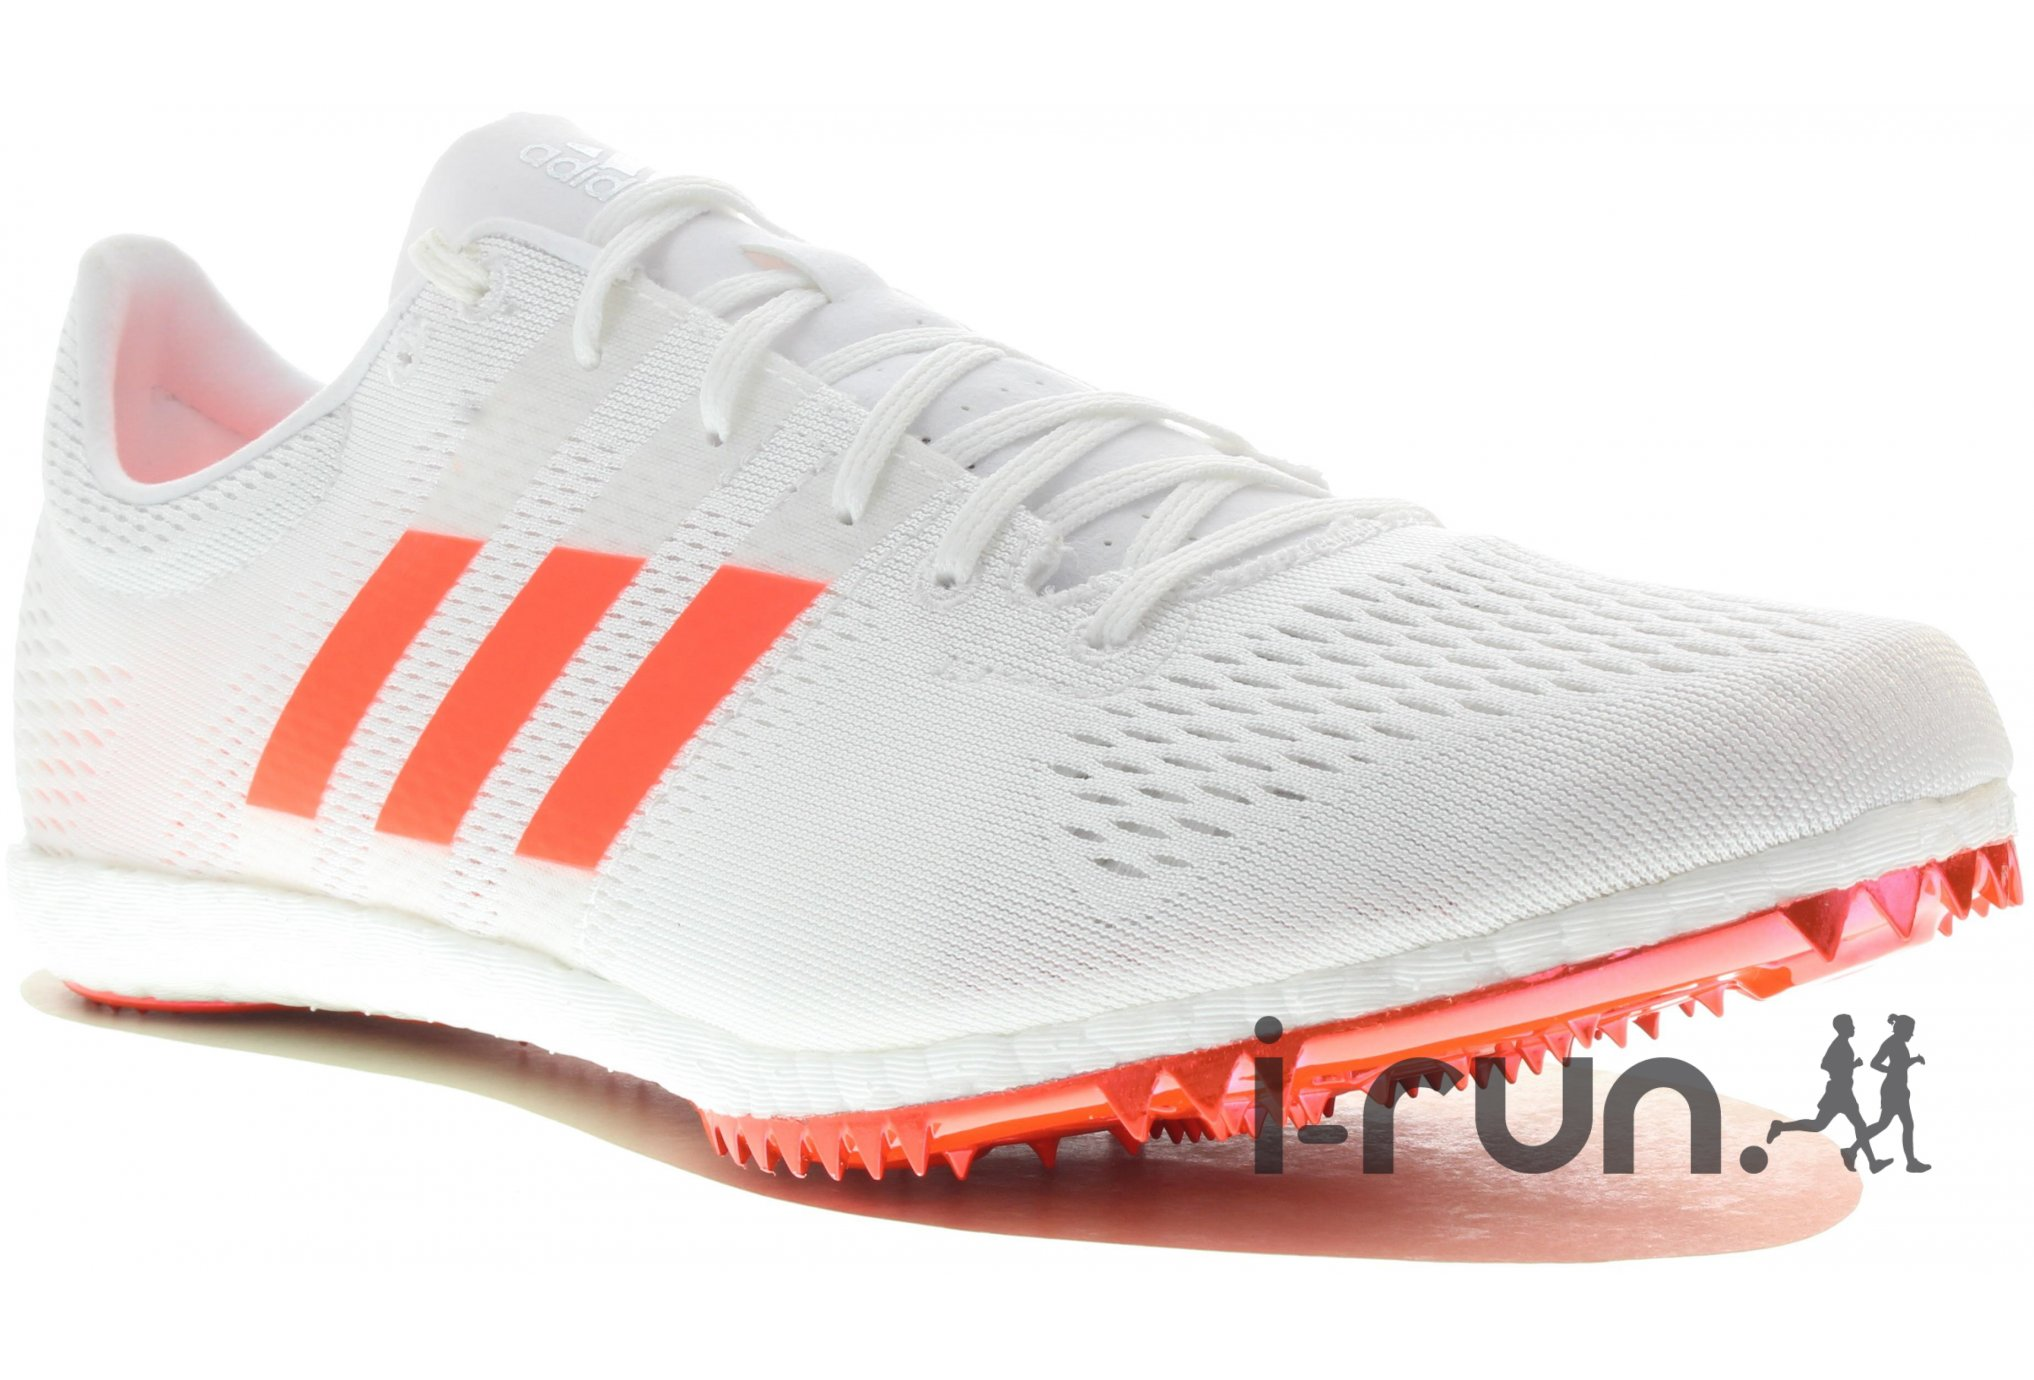 Adidas Adizero avanti boost m chaussures homme